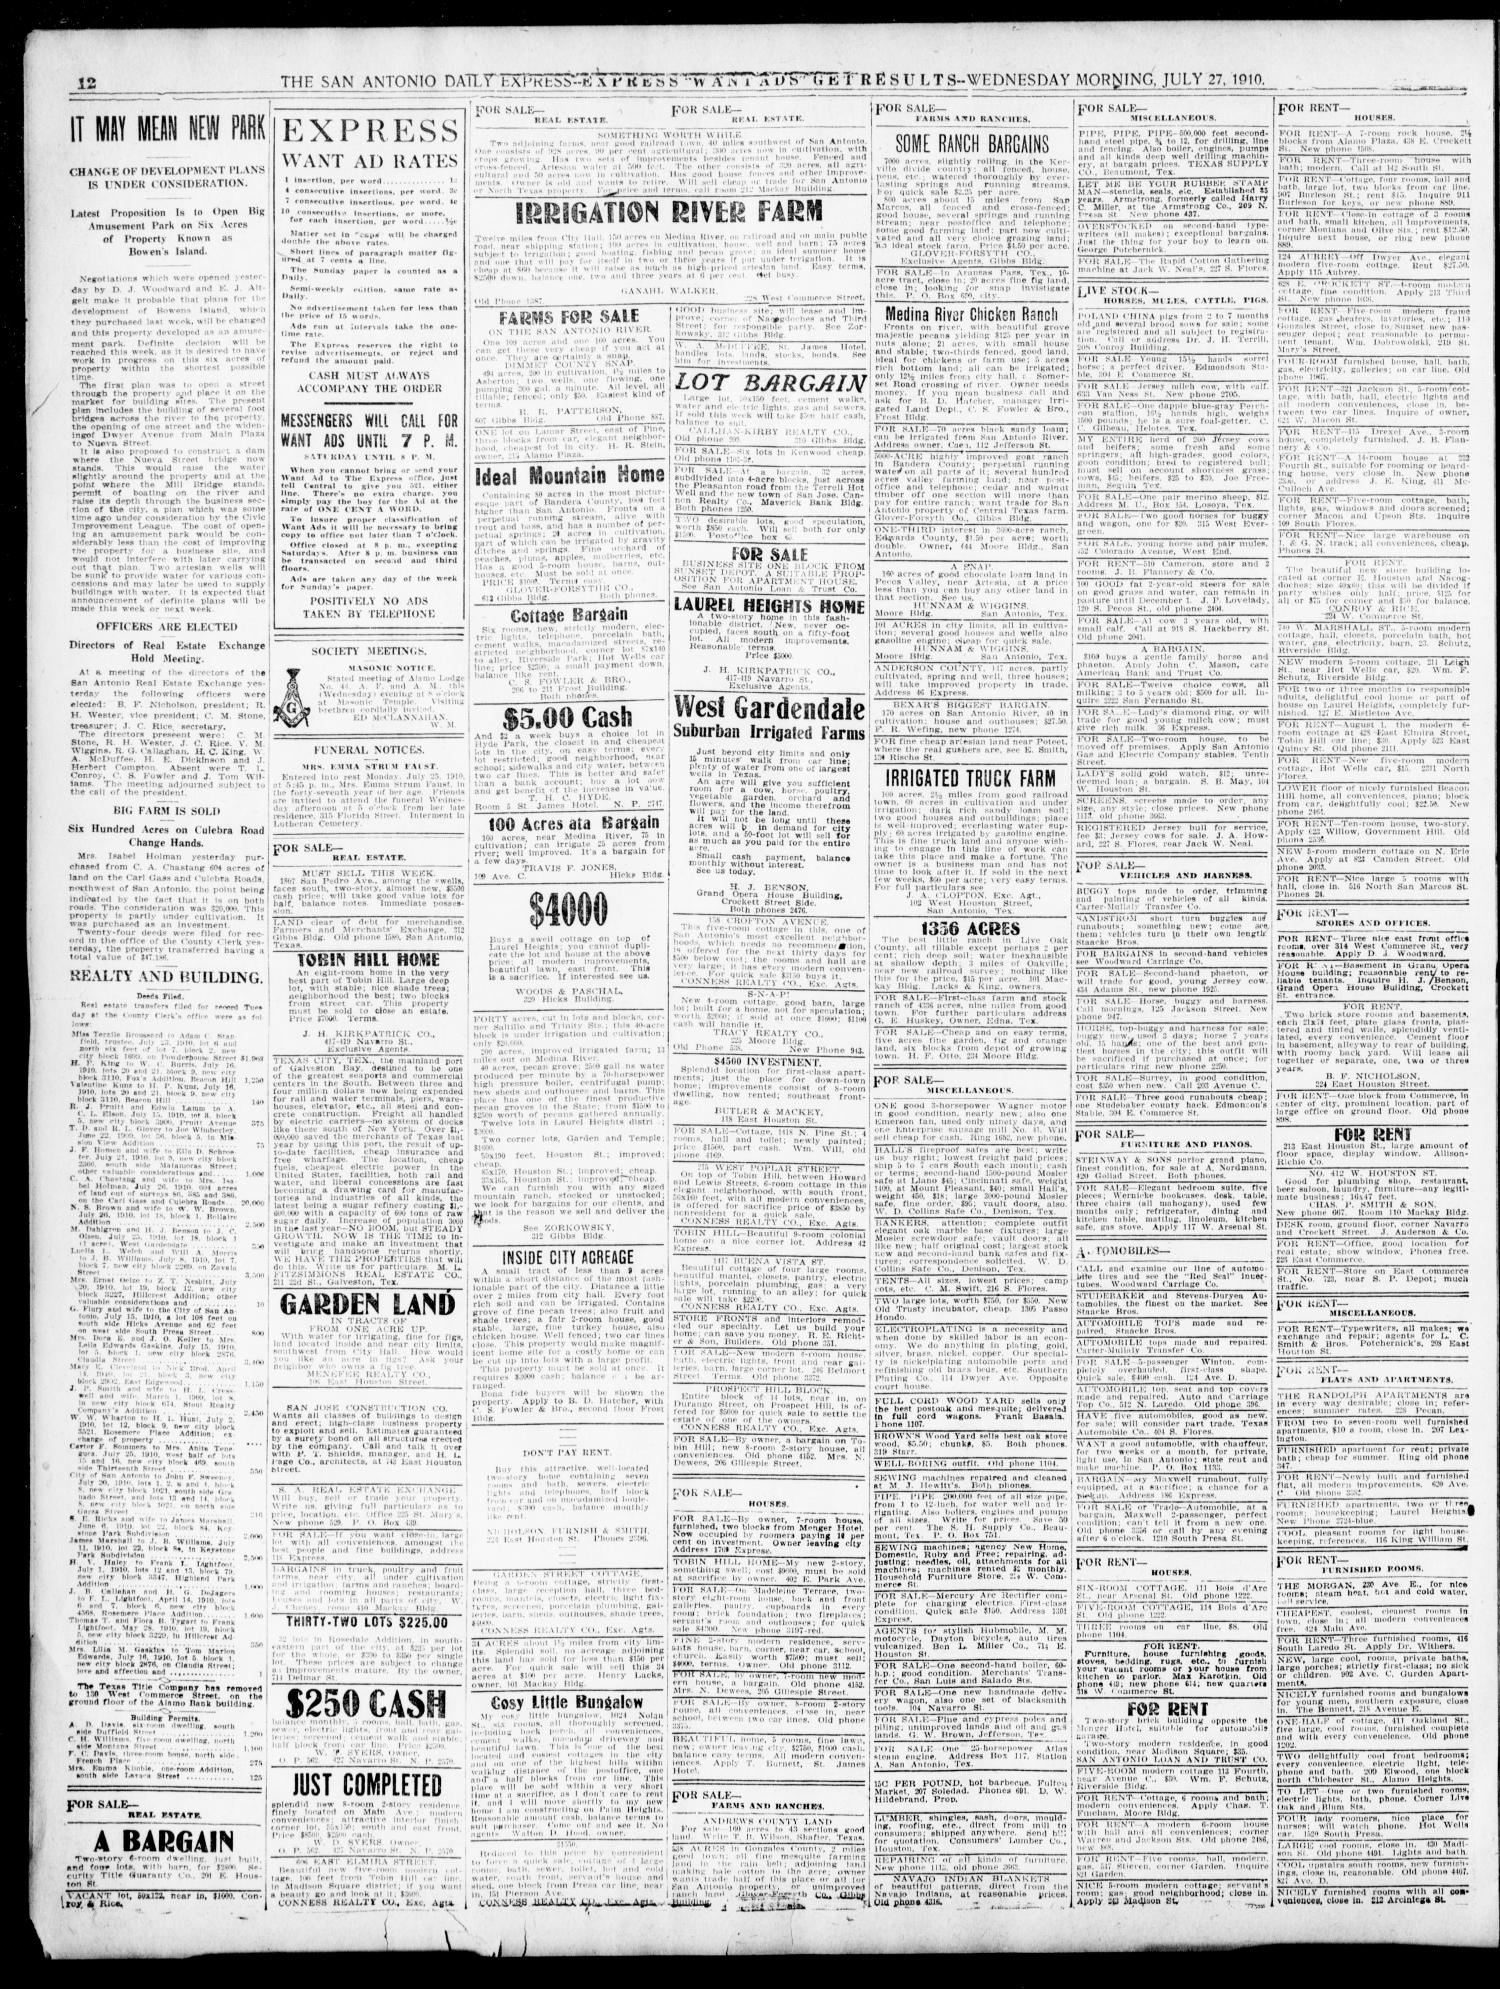 The Daily Express  (San Antonio, Tex ), Vol  45, No  208, Ed